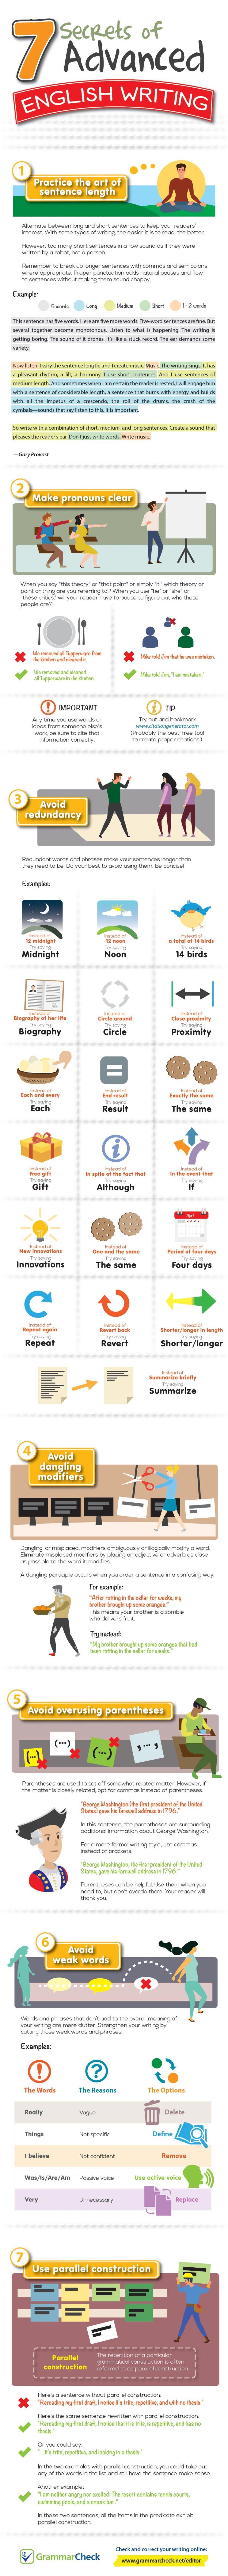 7 Secrets of Advanced English Writing (Infographic)